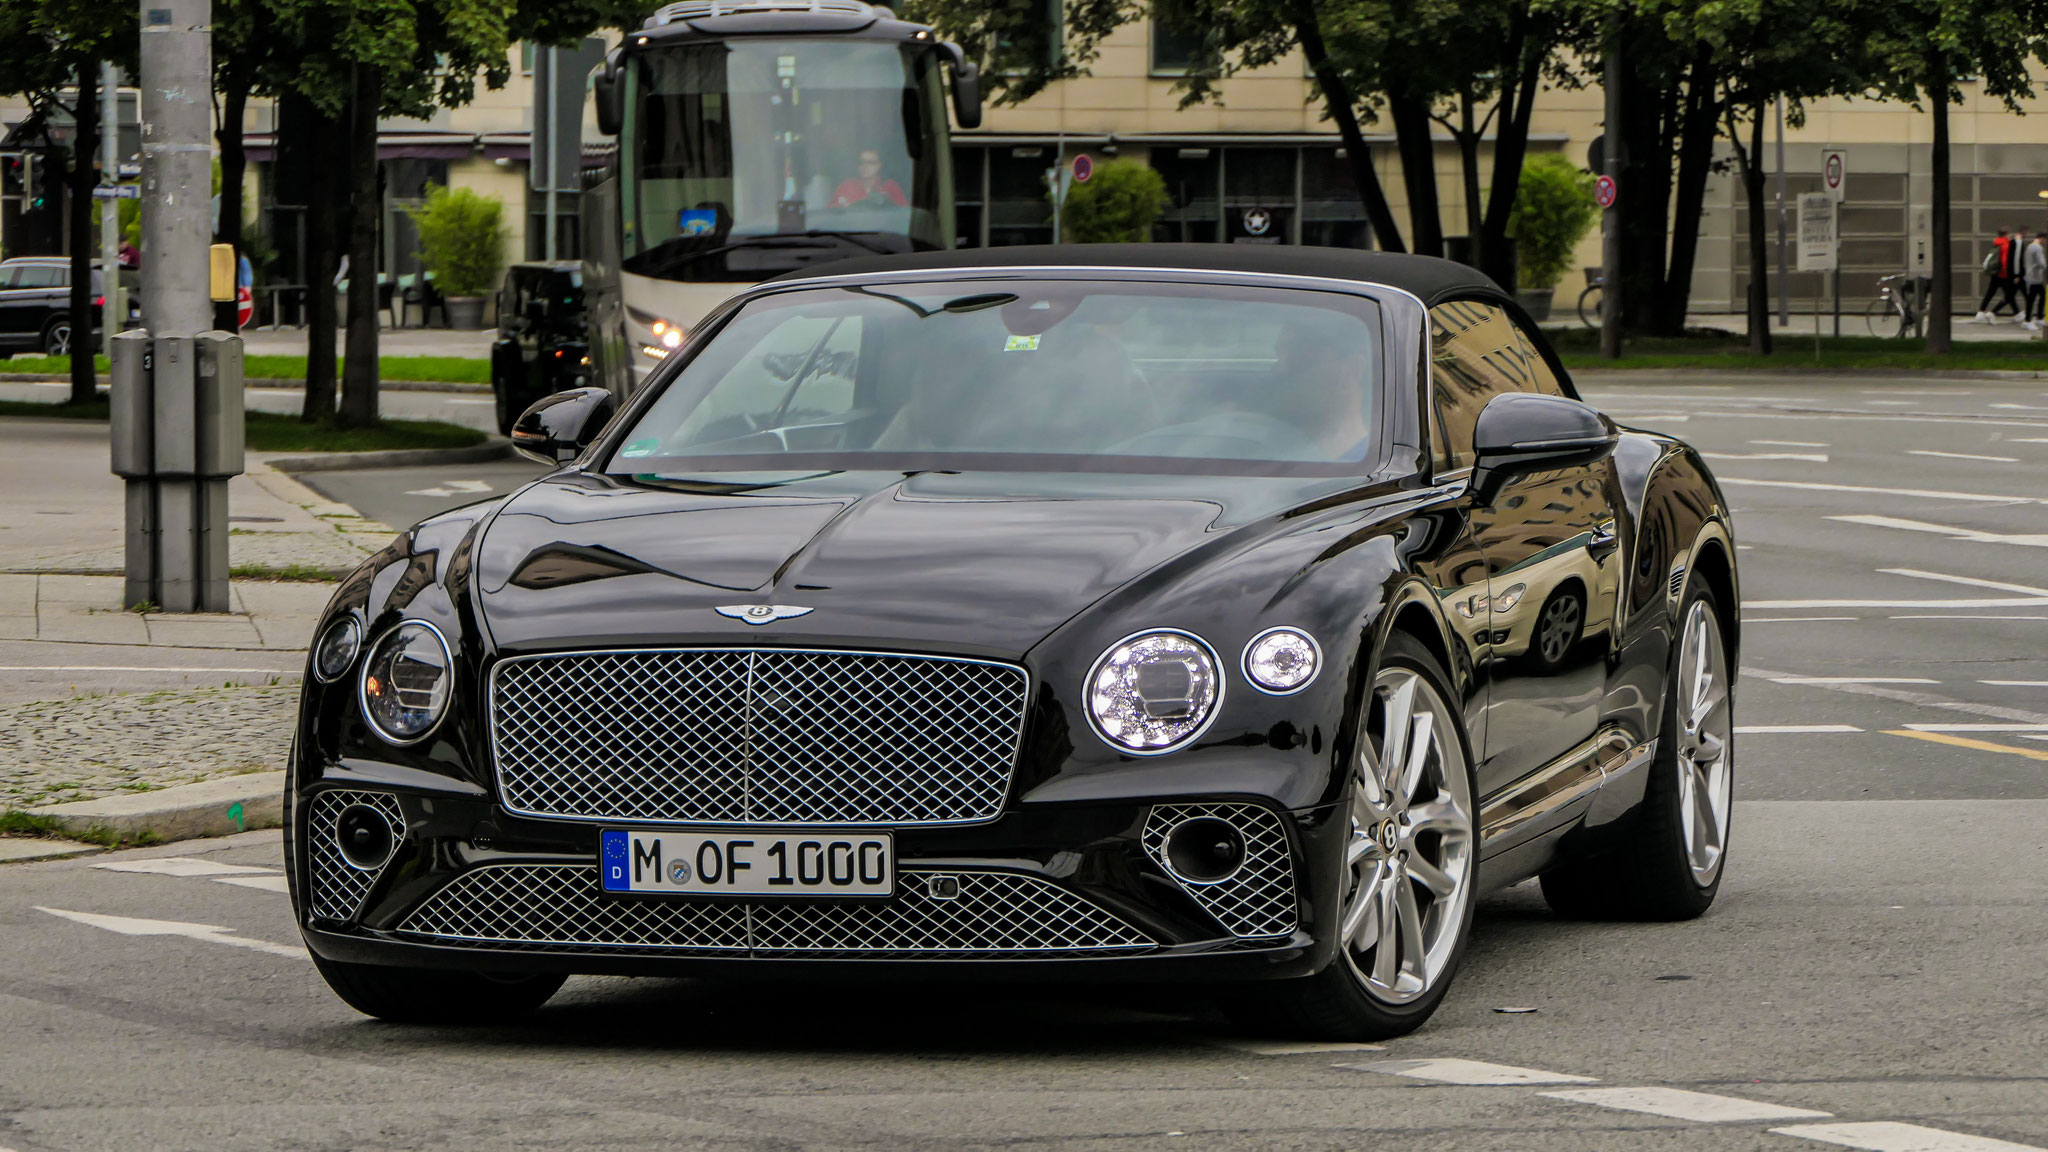 Bentley Continental GTC - M-OF-1000